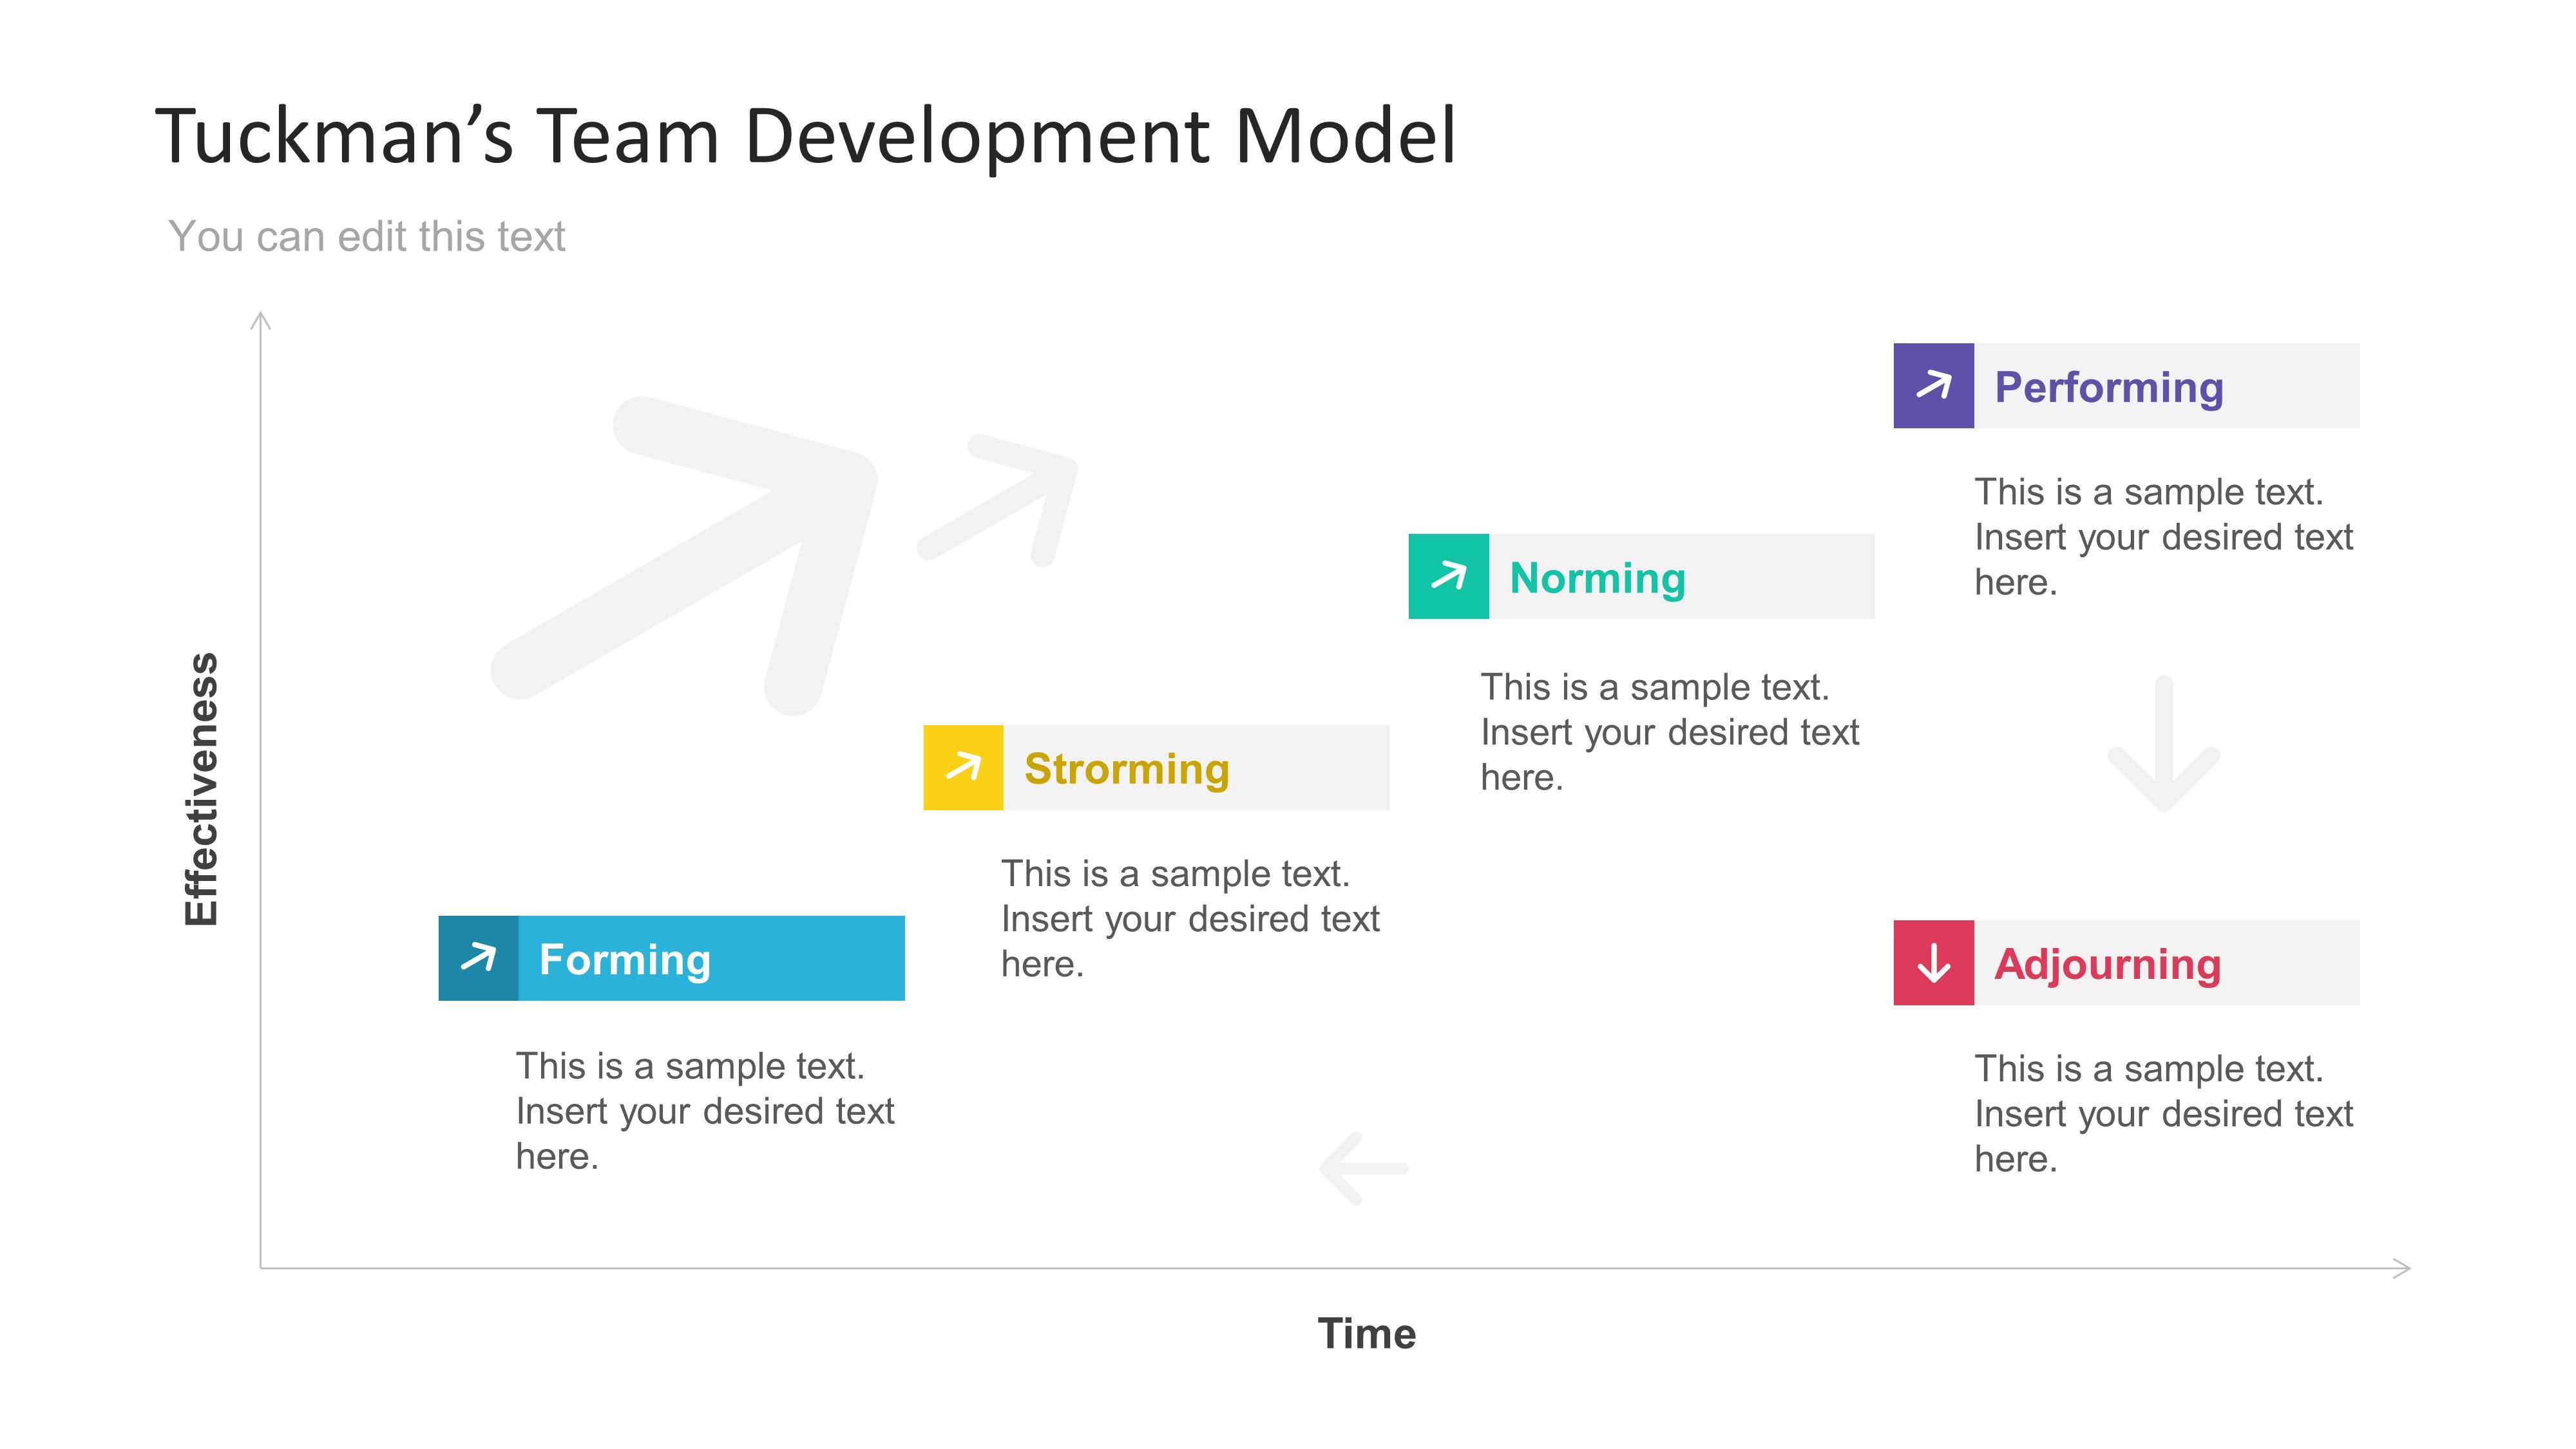 tuckmans five stage model